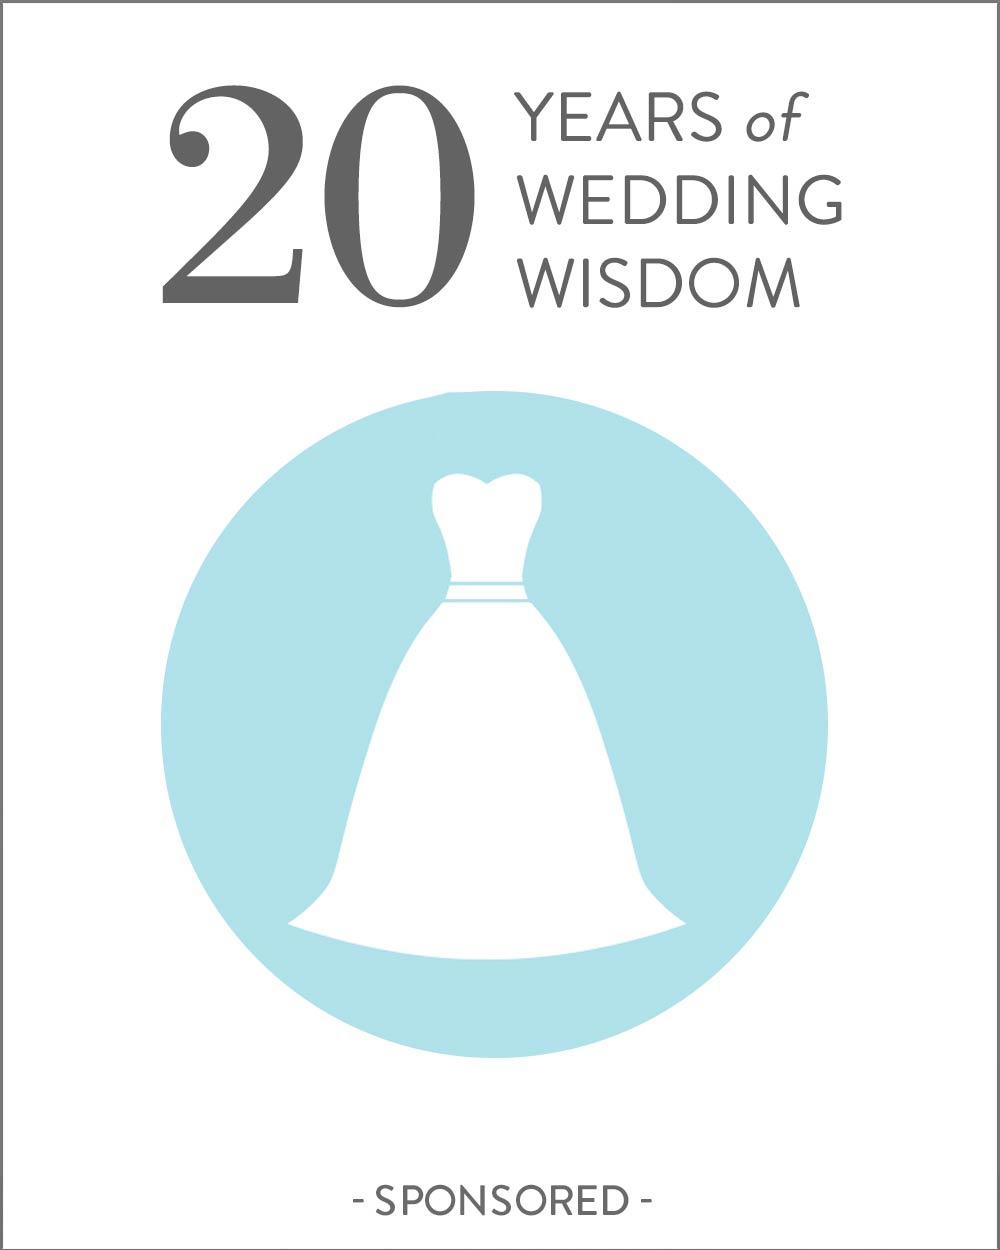 wedding-wisdom-dresses-1214.jpg